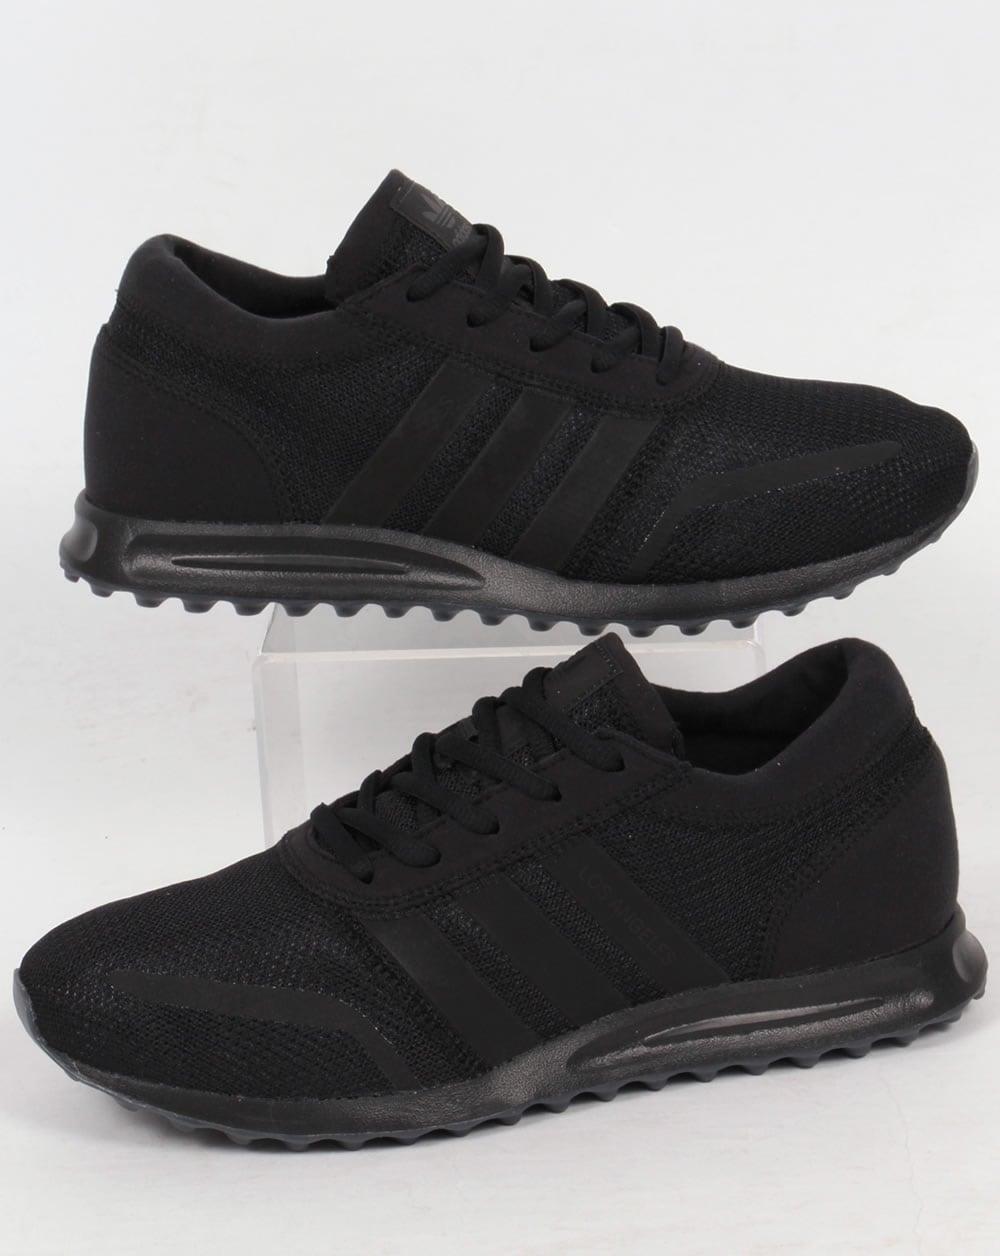 Adidas Los Angeles Trainers Triple Black